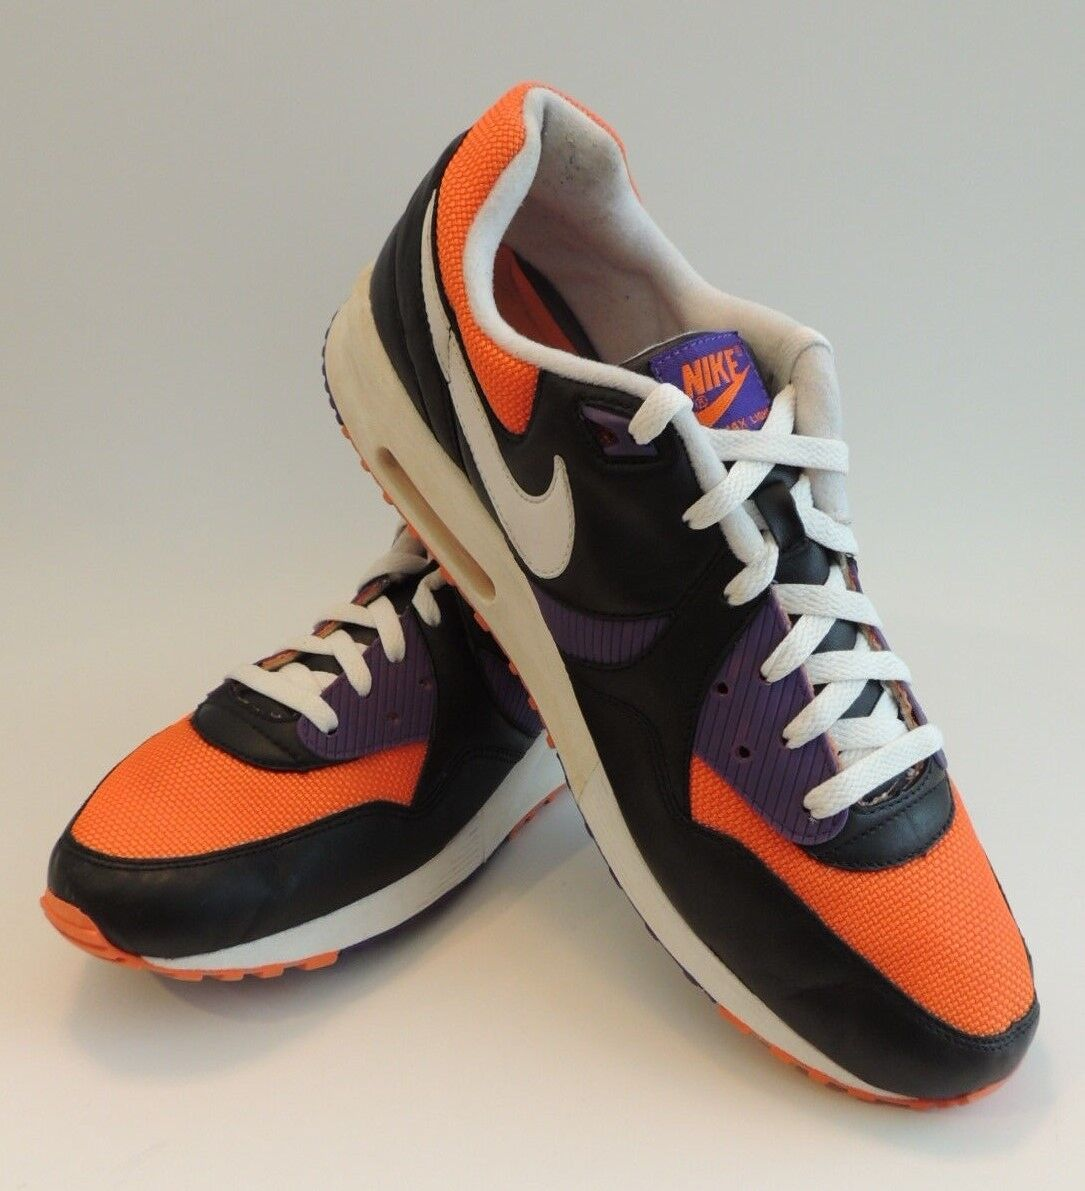 Nike Air Max Light Jogging Tennis shoes Sneaker 13 Phoenix Suns Purple orange OG